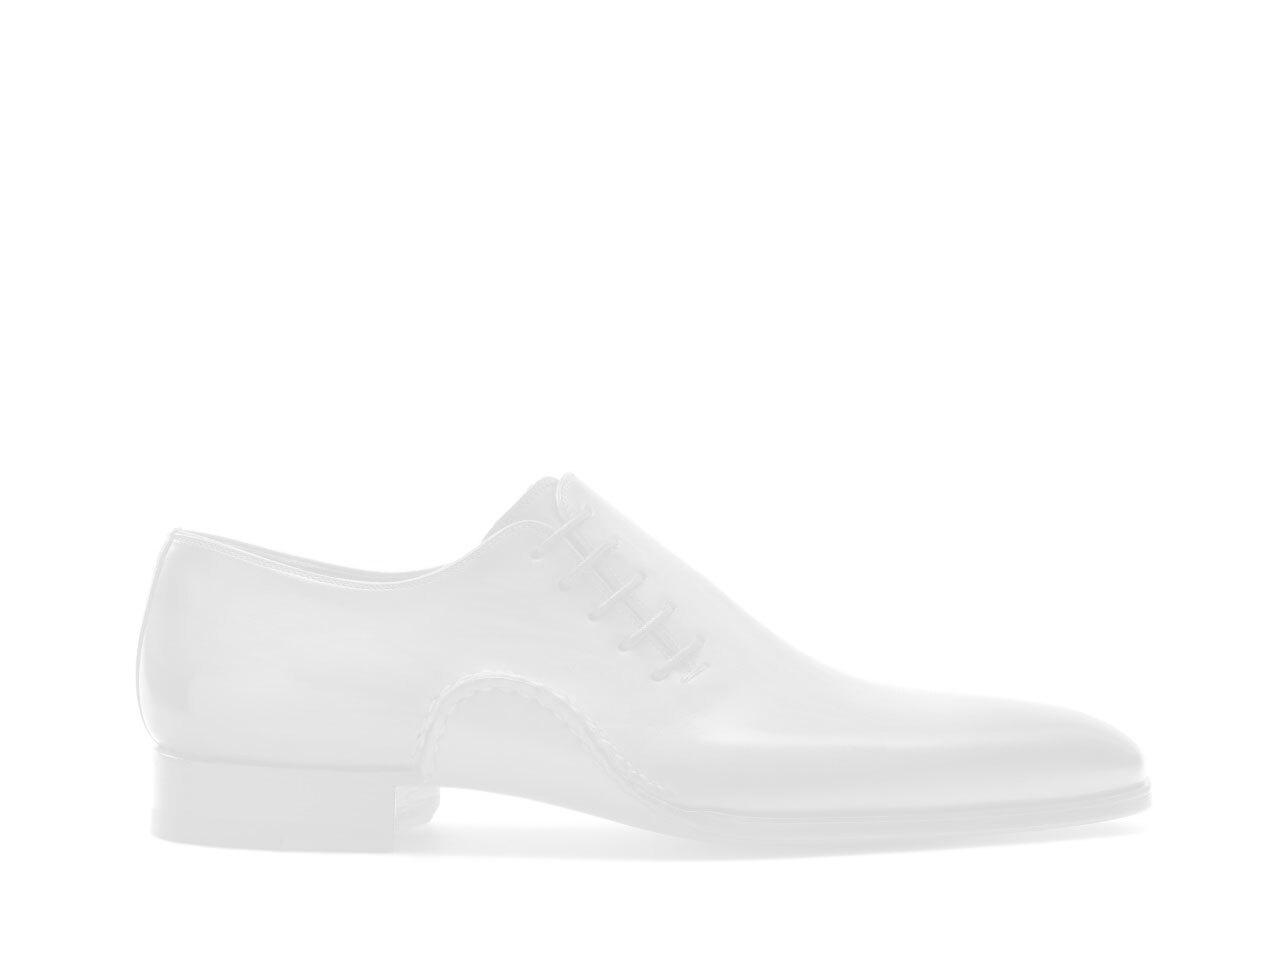 Sole of the Magnanni Bolsena Grey Men's Derby Shoes